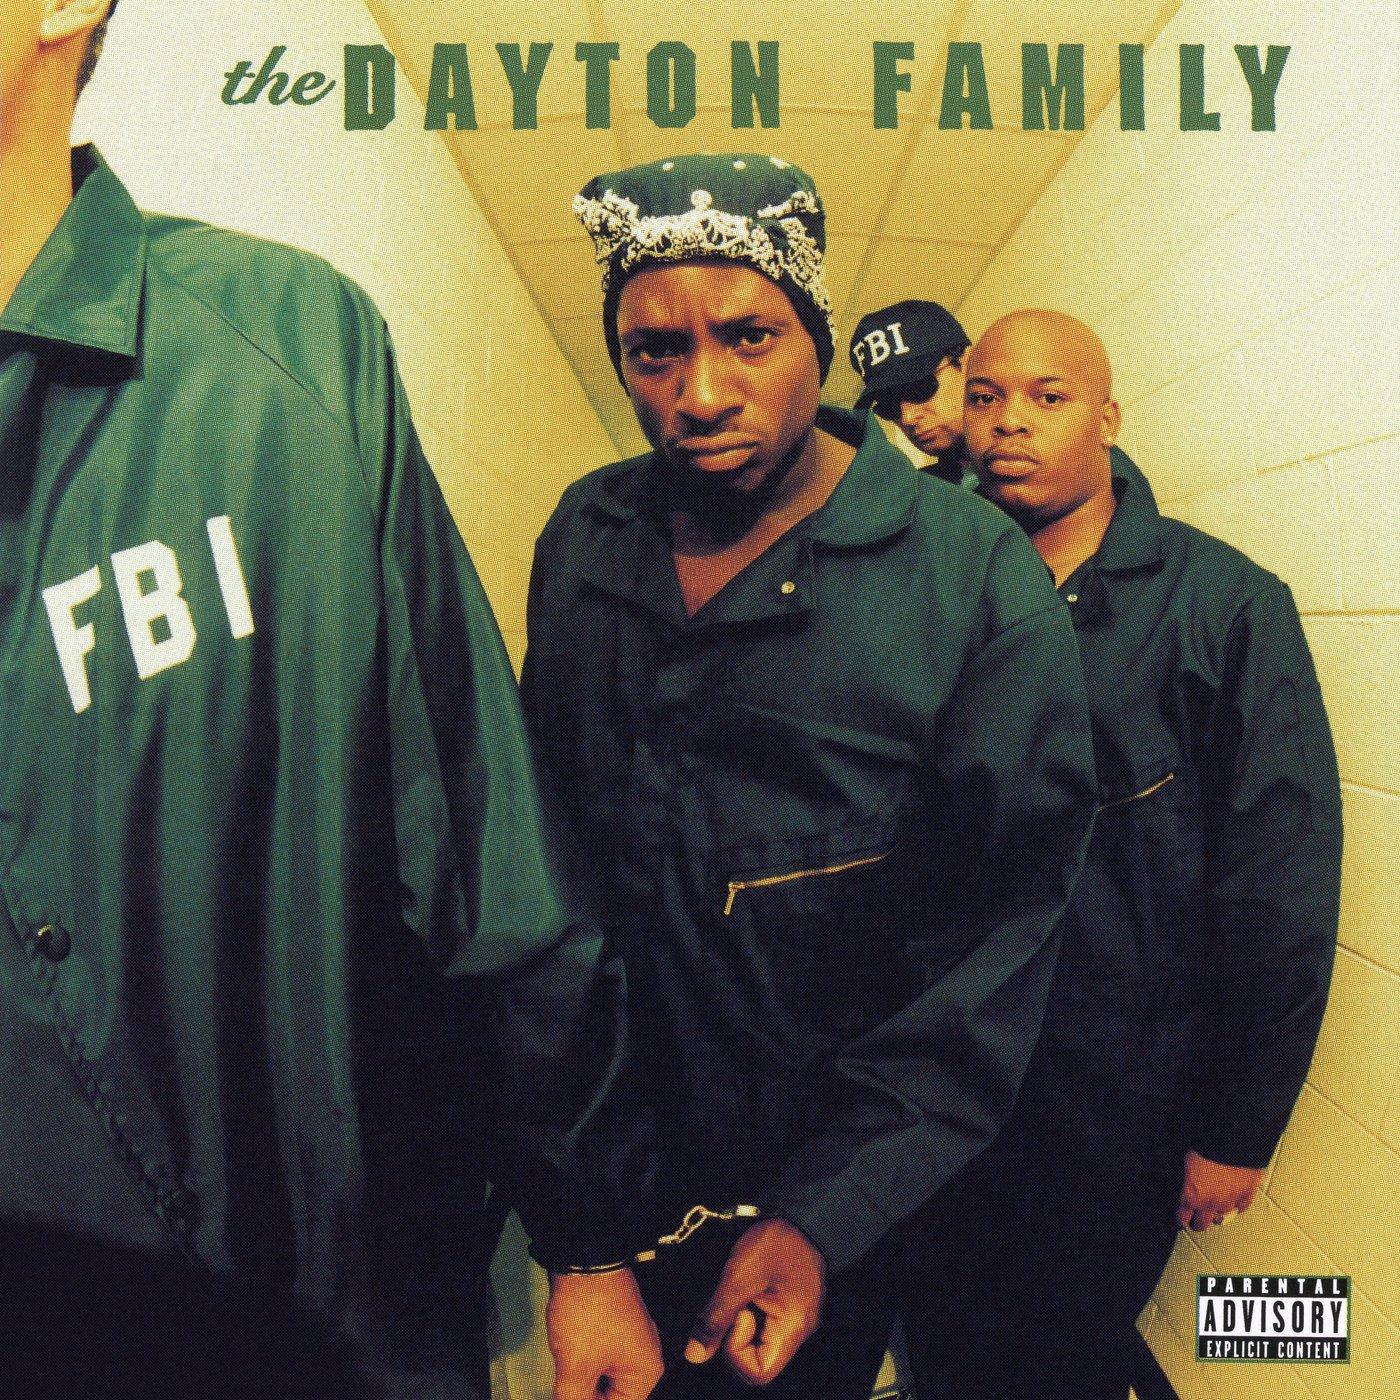 The Dayton Family - F.B.I. (1996) [FLAC] Download